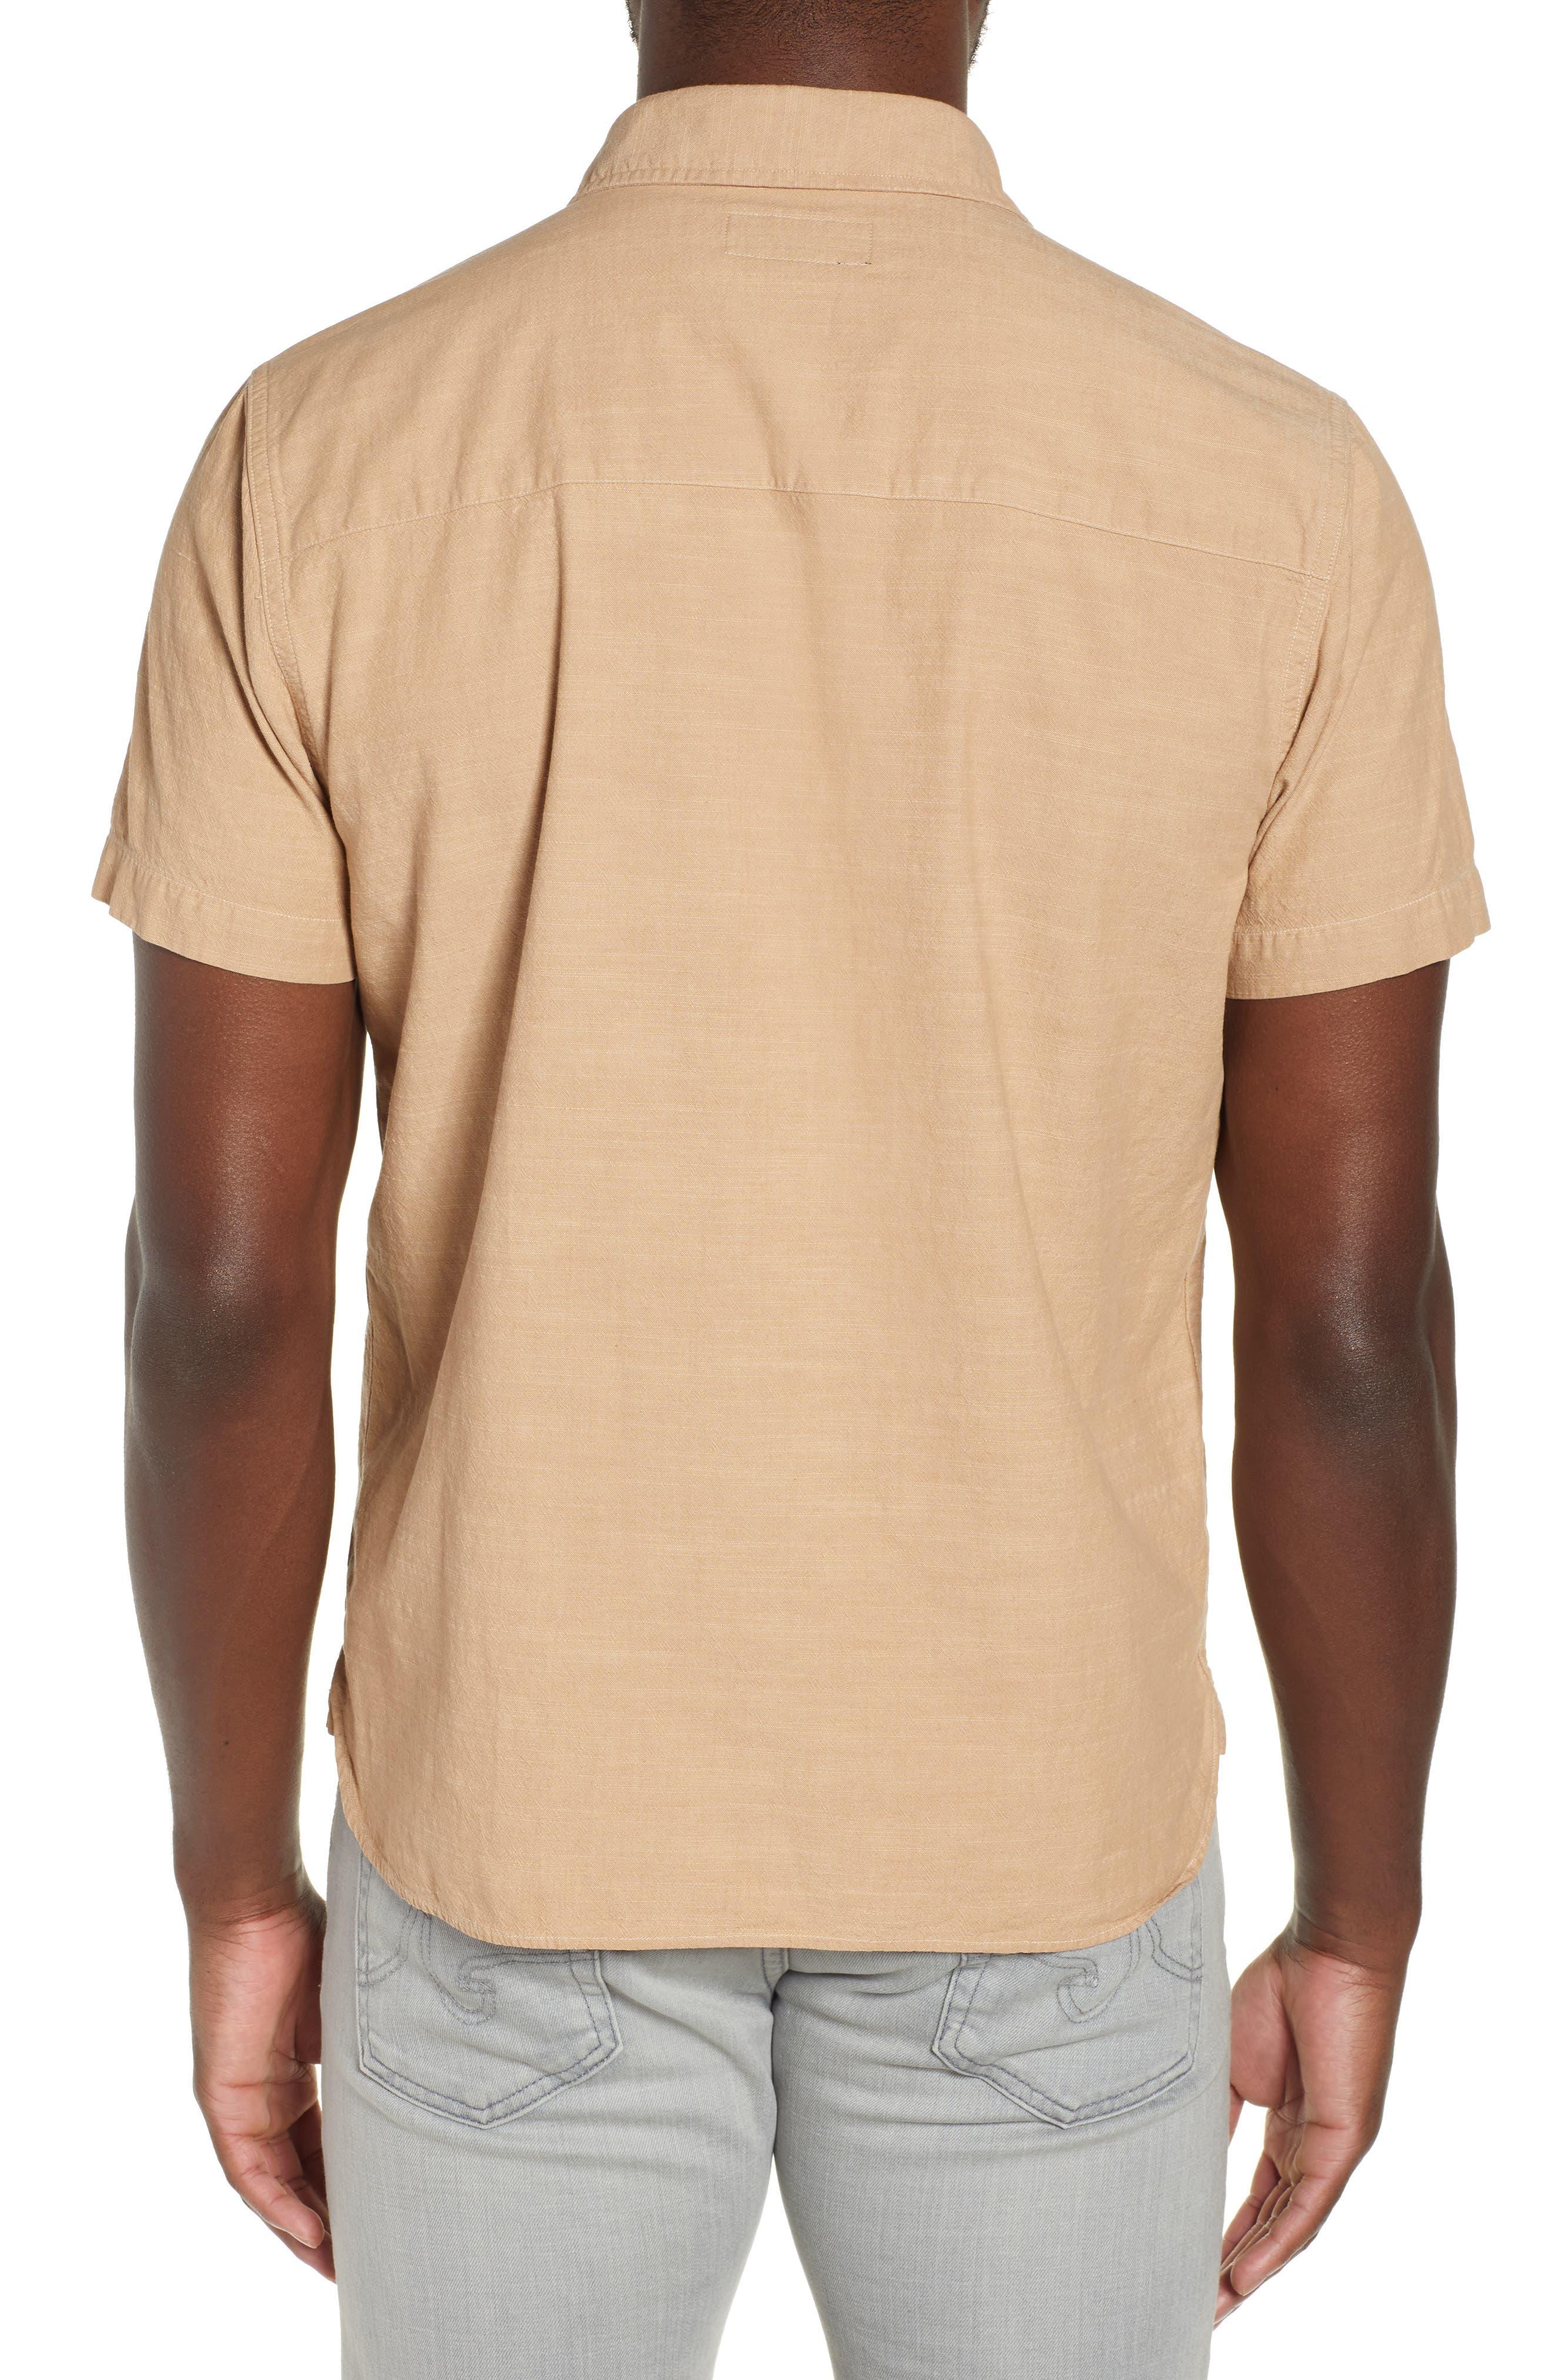 FRYE,                             Addison Chambray Woven Shirt,                             Alternate thumbnail 3, color,                             KRAFT BROWN